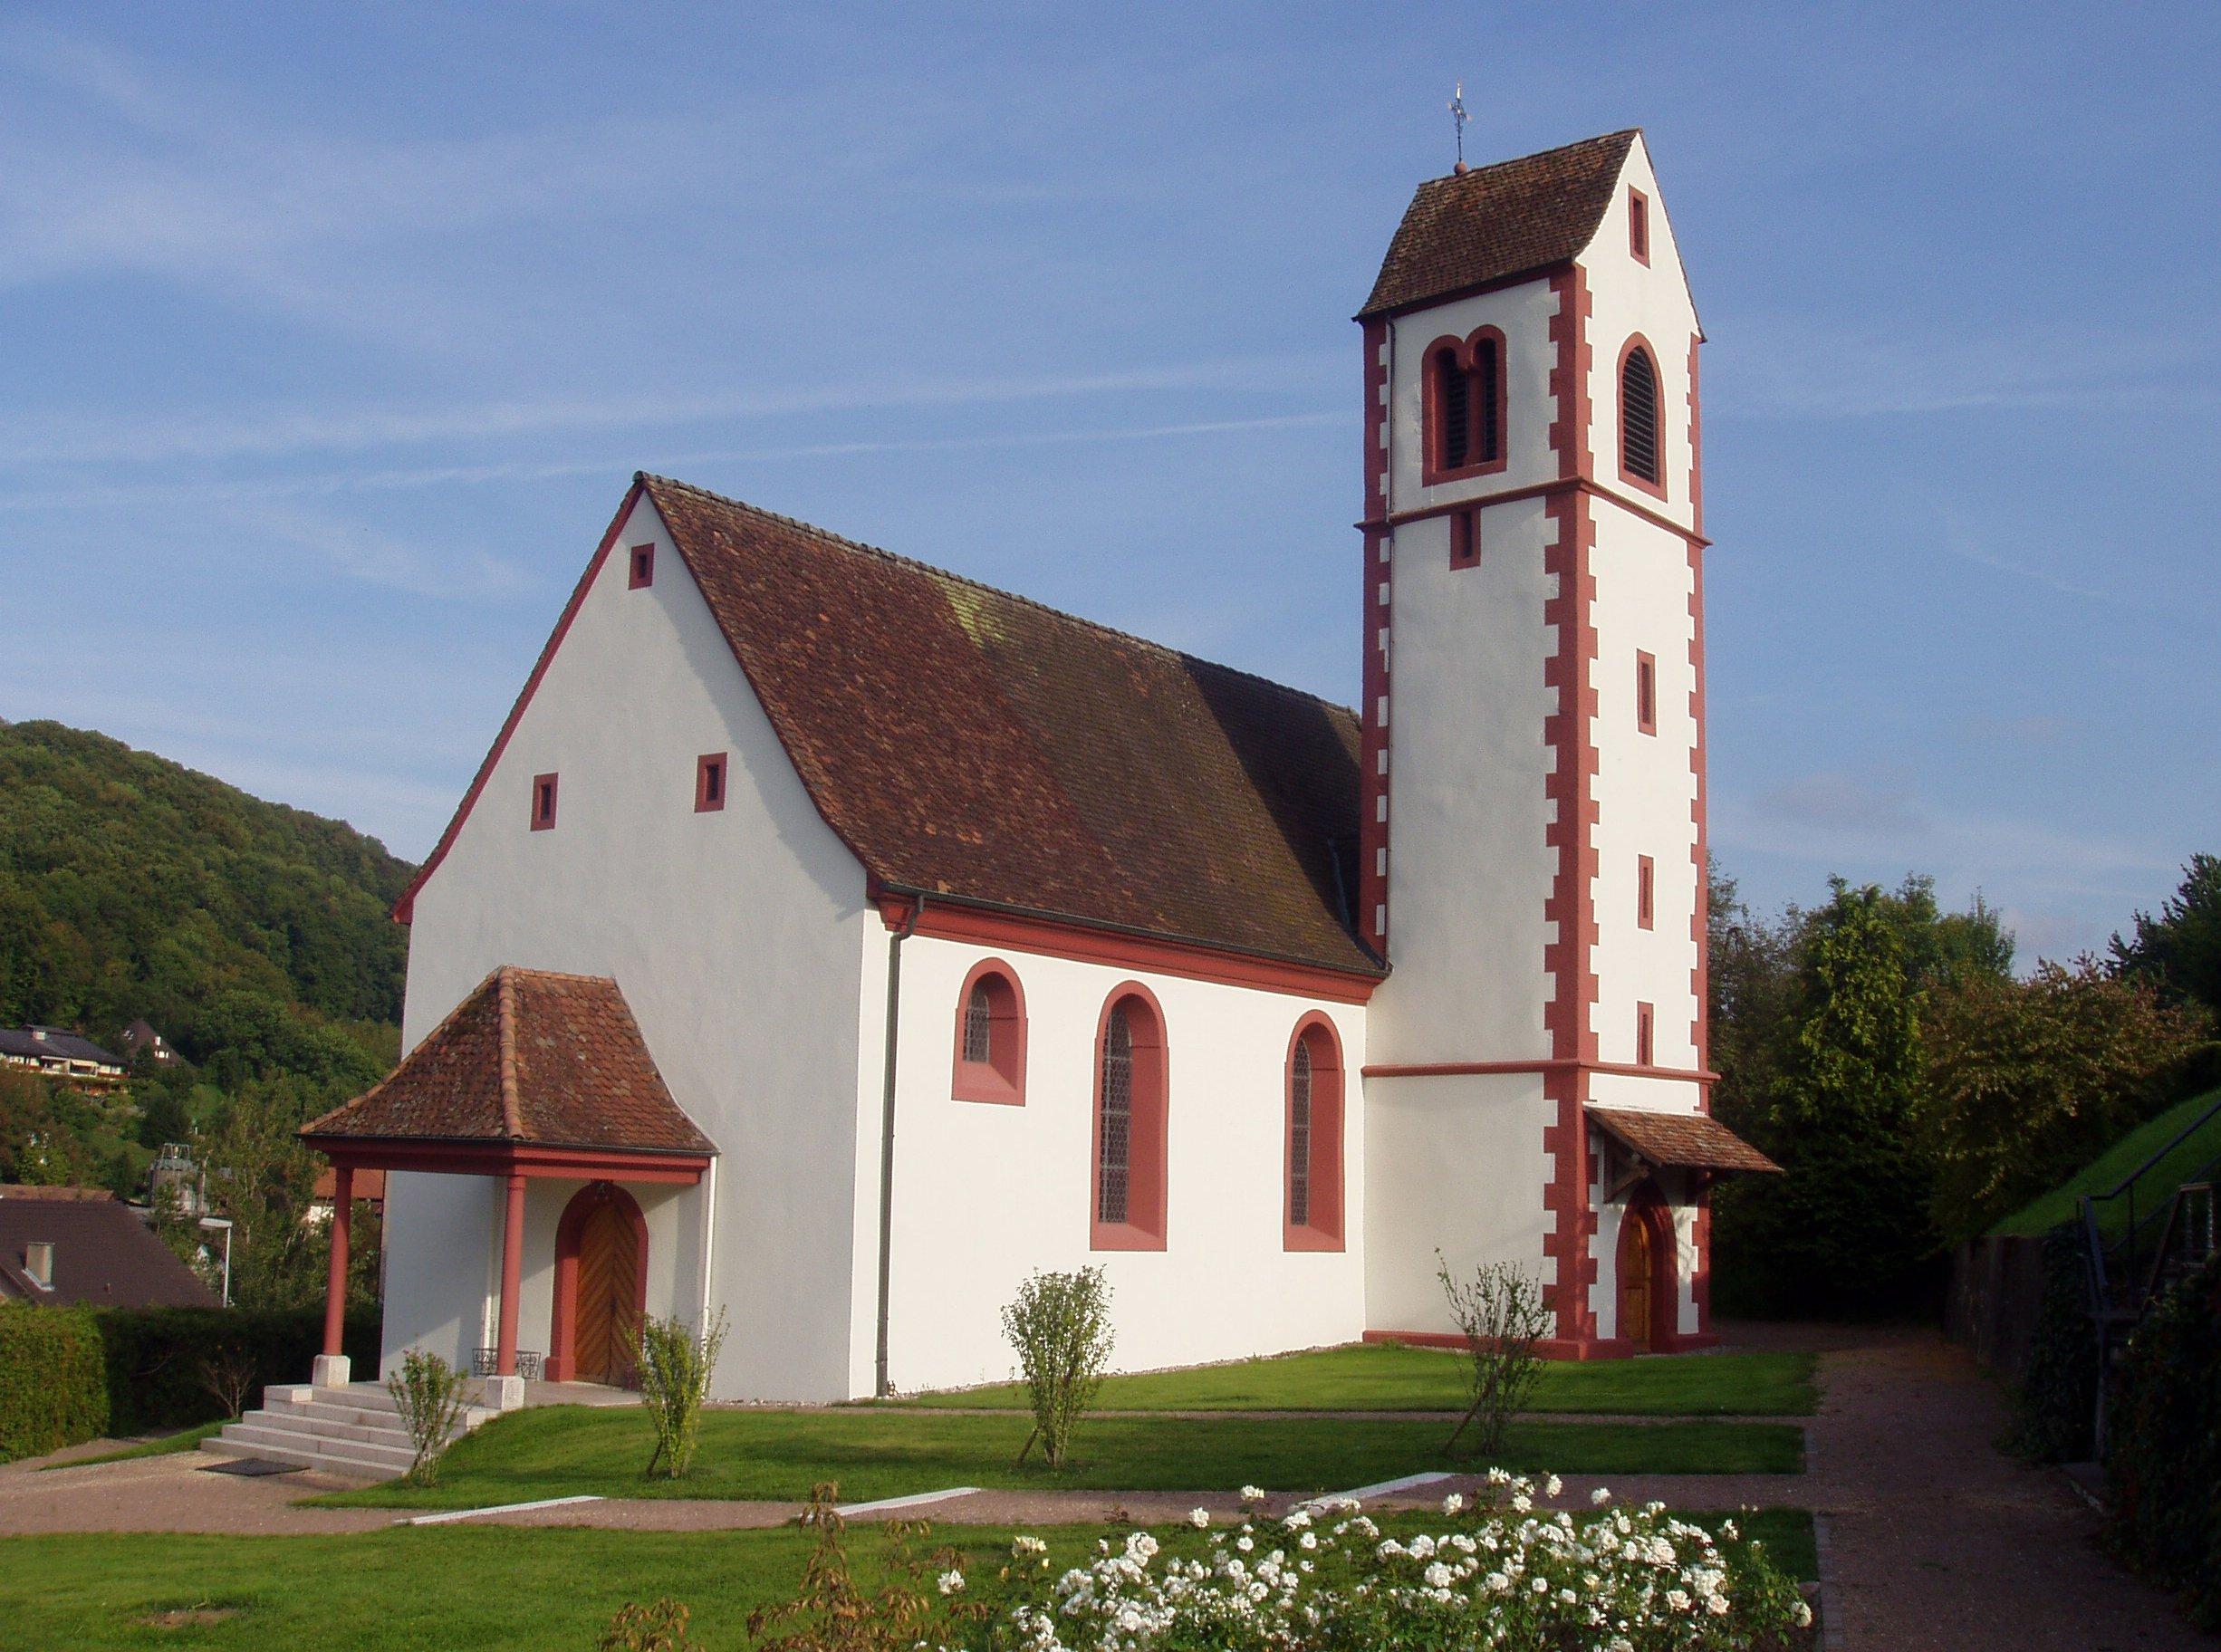 Kirche Peter und Paul Obermumpf